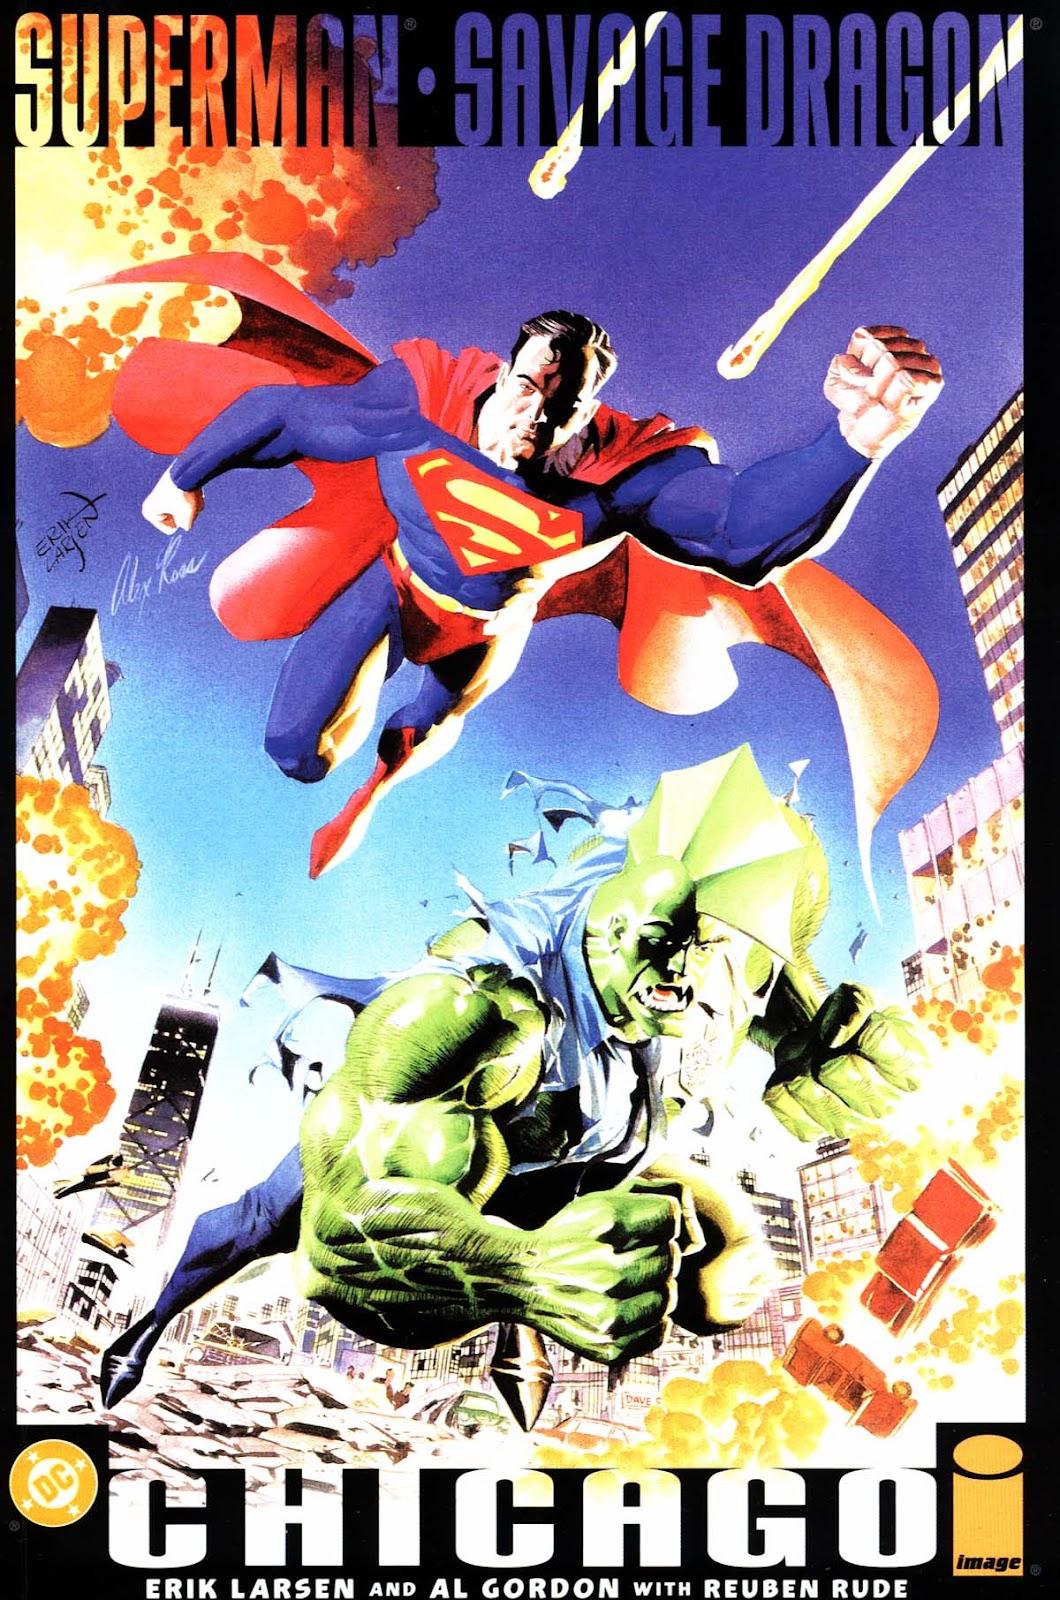 Superman & Savage Dragon: Chicago Full Page 1